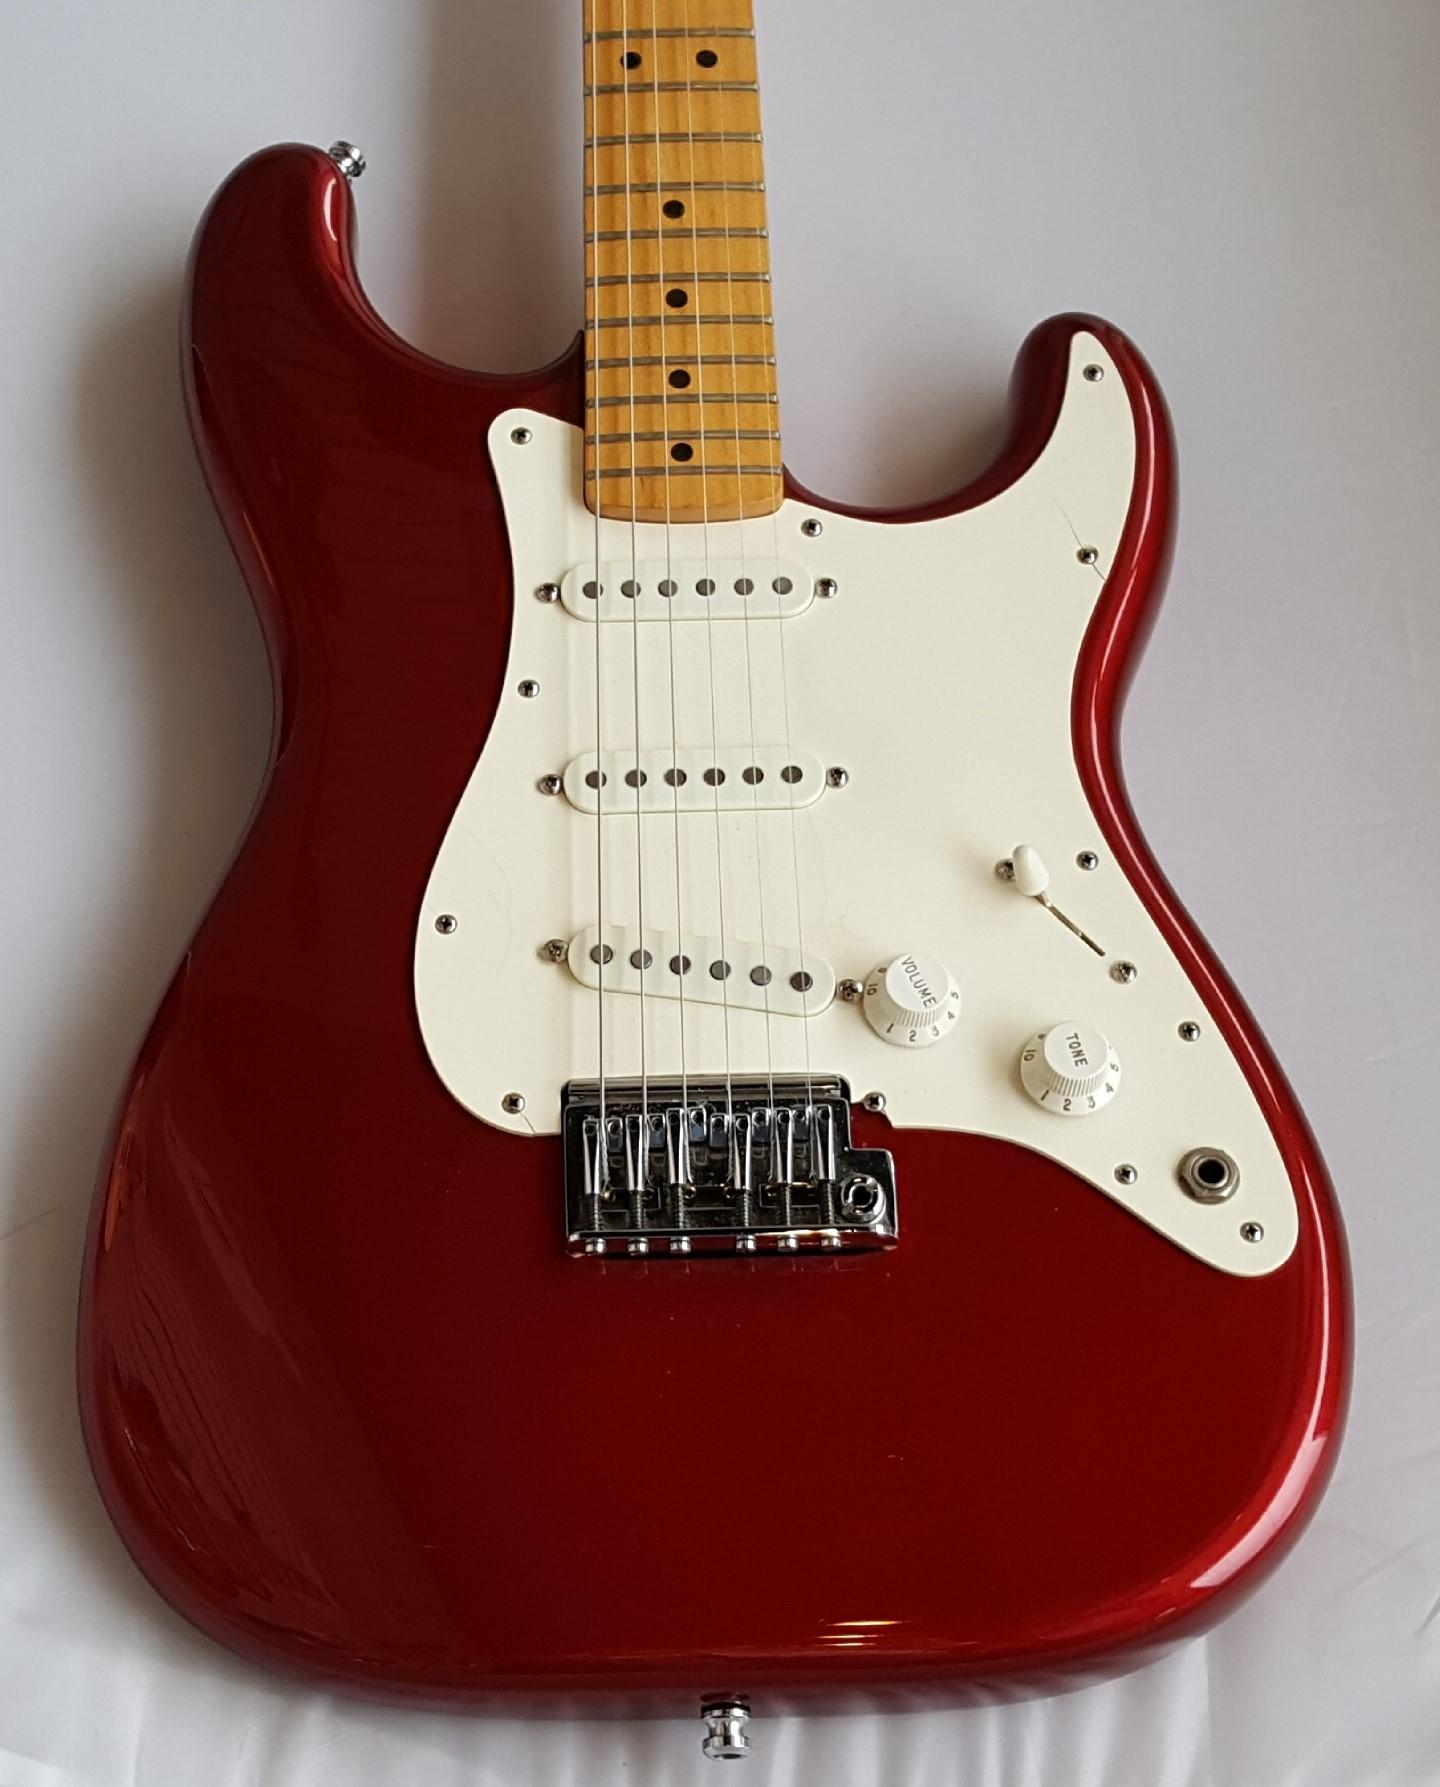 Fender Stratocaster Rare 2 Knob Model Candy Apple Red 1983